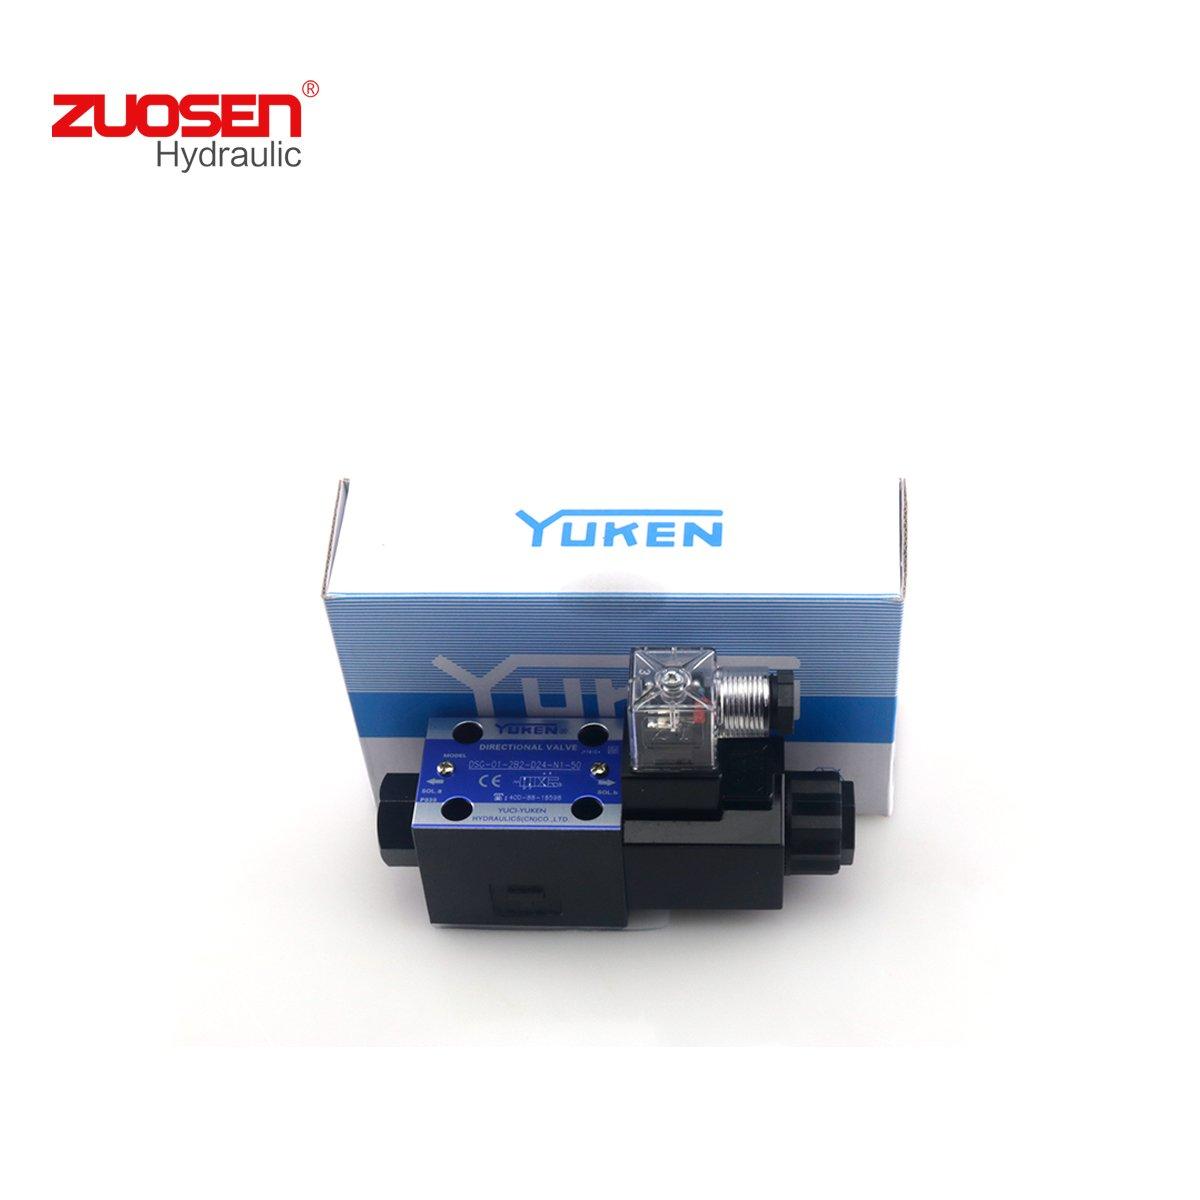 Yuken DSG-01-2B2-D24-N1-70 Hydraulic Valves